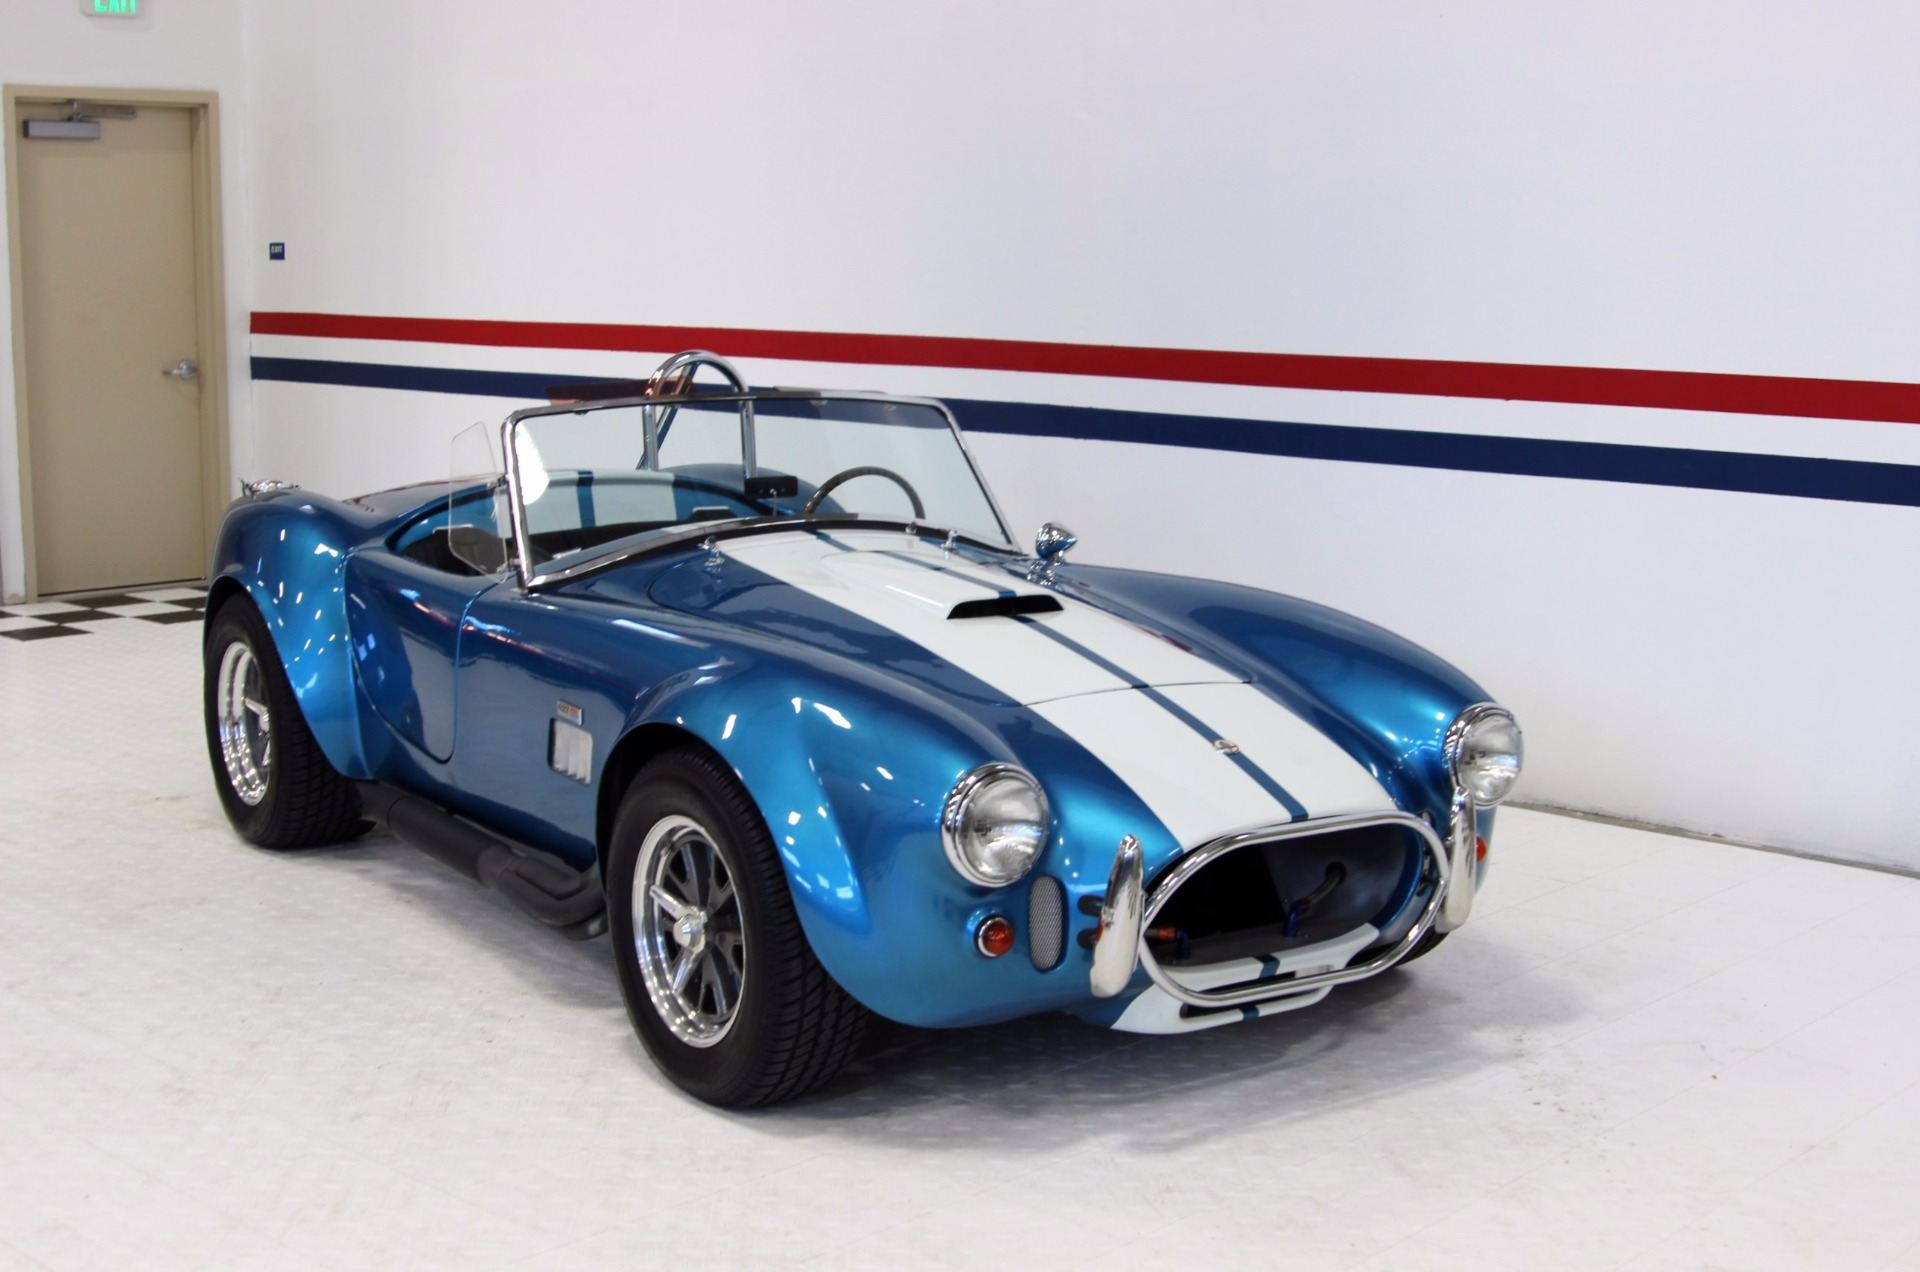 Used 1966 ac shell valley cobra replica